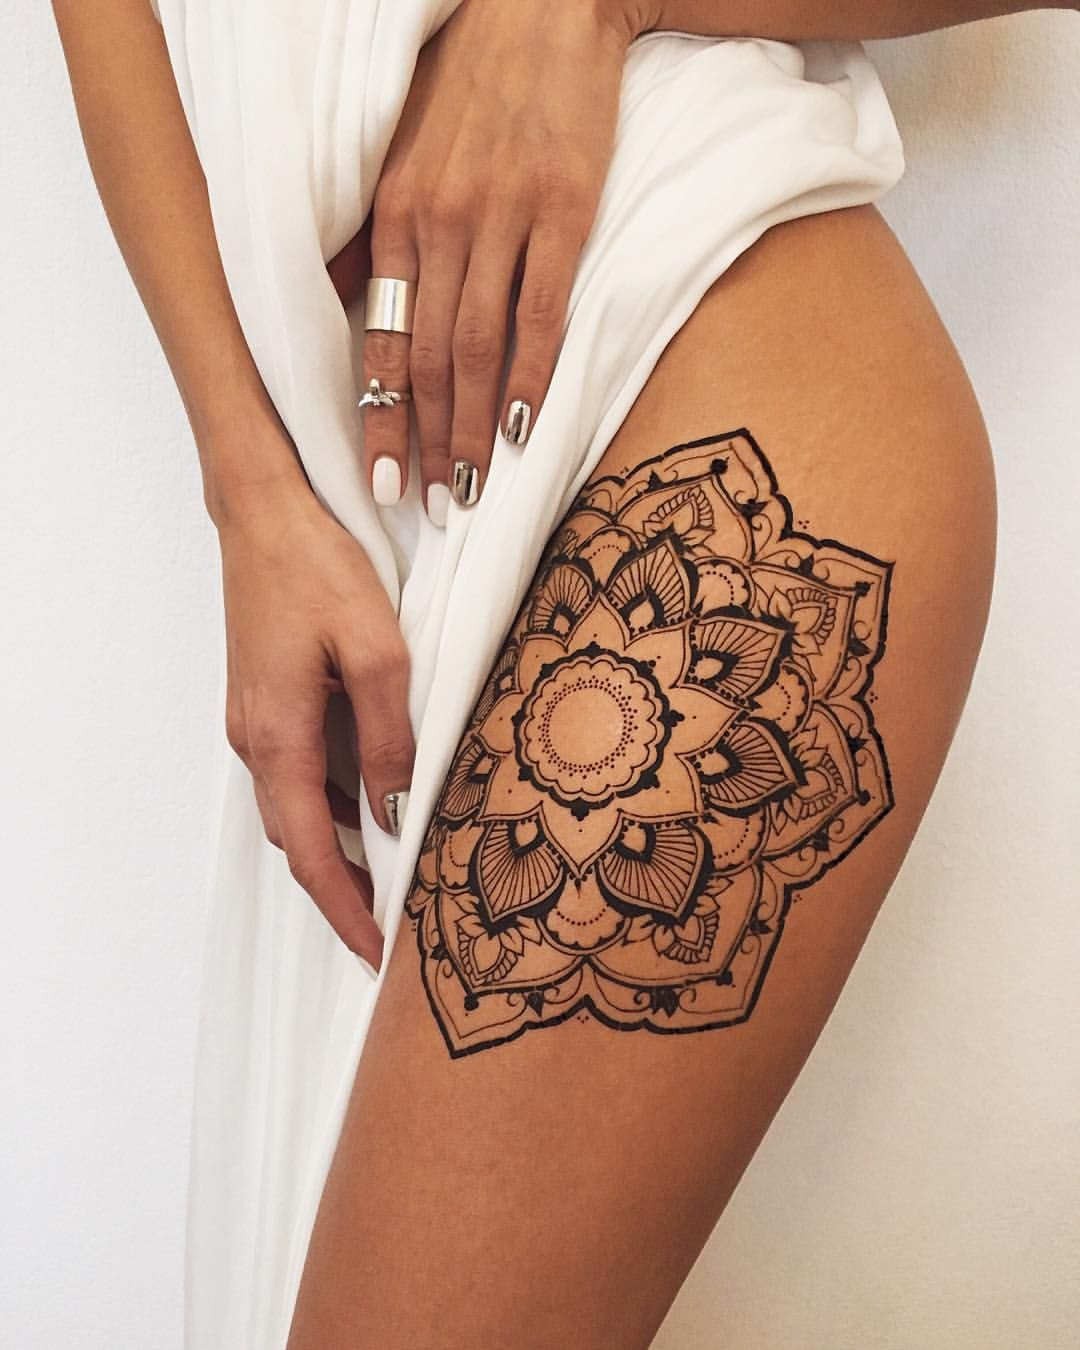 pinterest | cosmicislander ✧ | bodyart | tatouage, tatouages